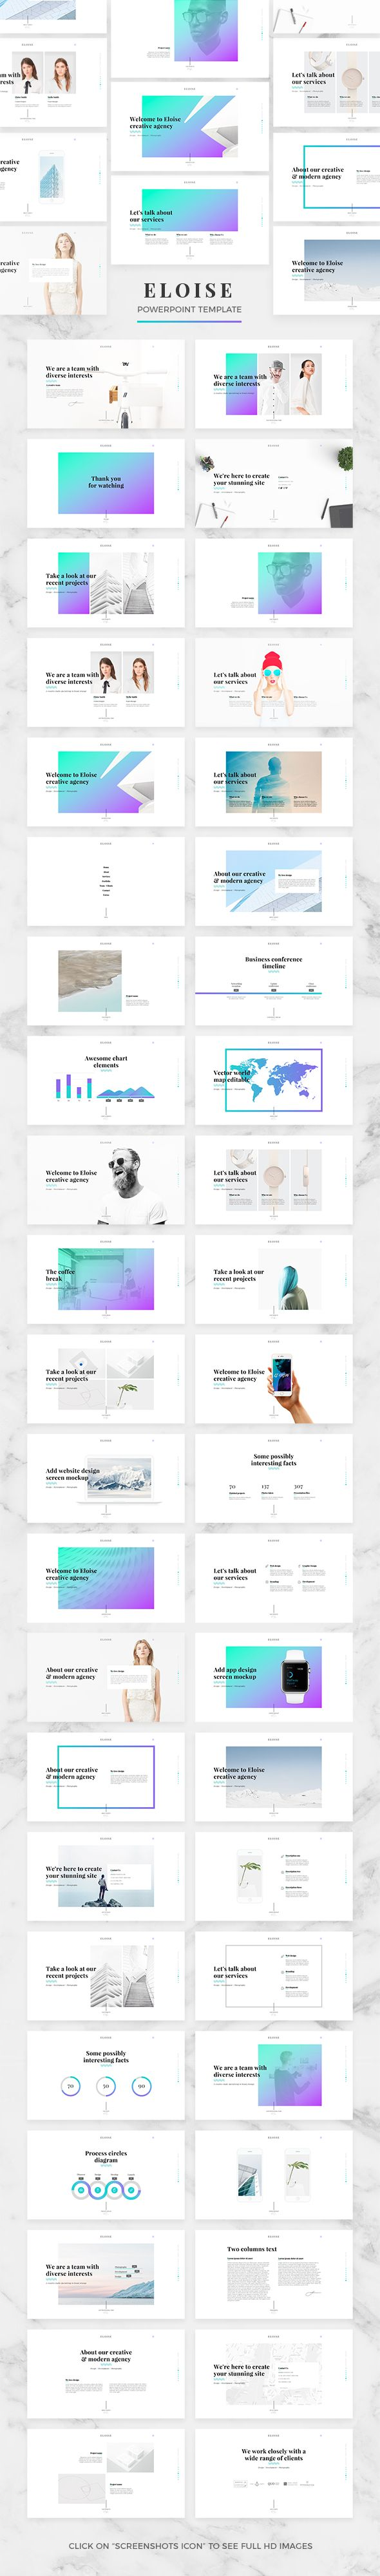 Eloise - Creative PowerPoint Template